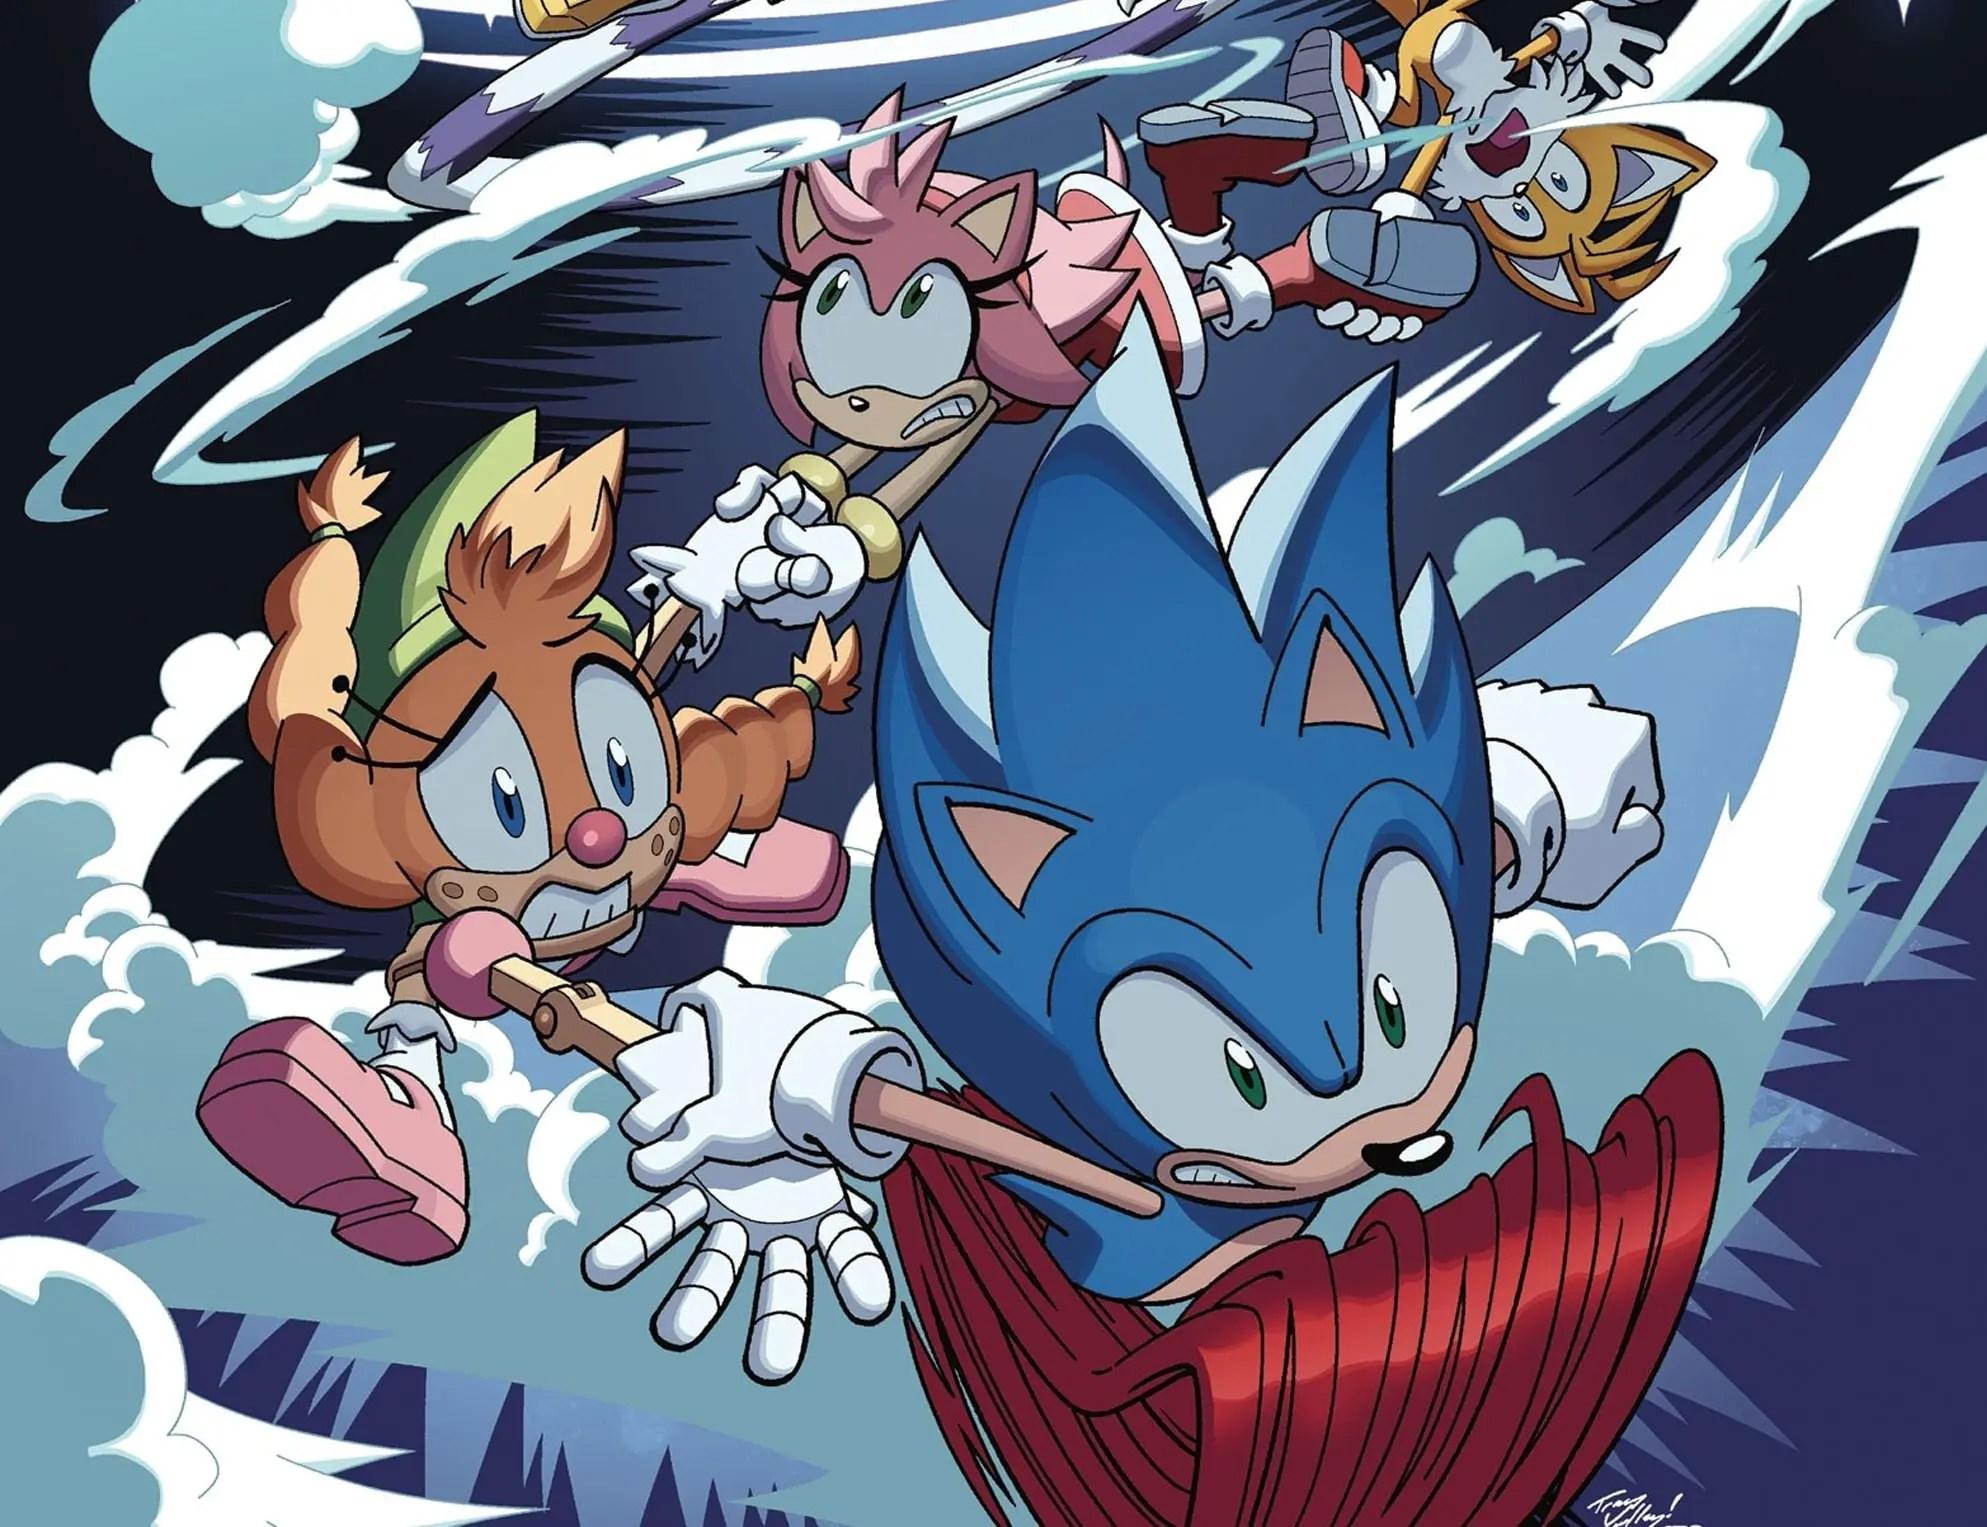 'Sonic the Hedgehog' #40 is quintessential Sonic comics